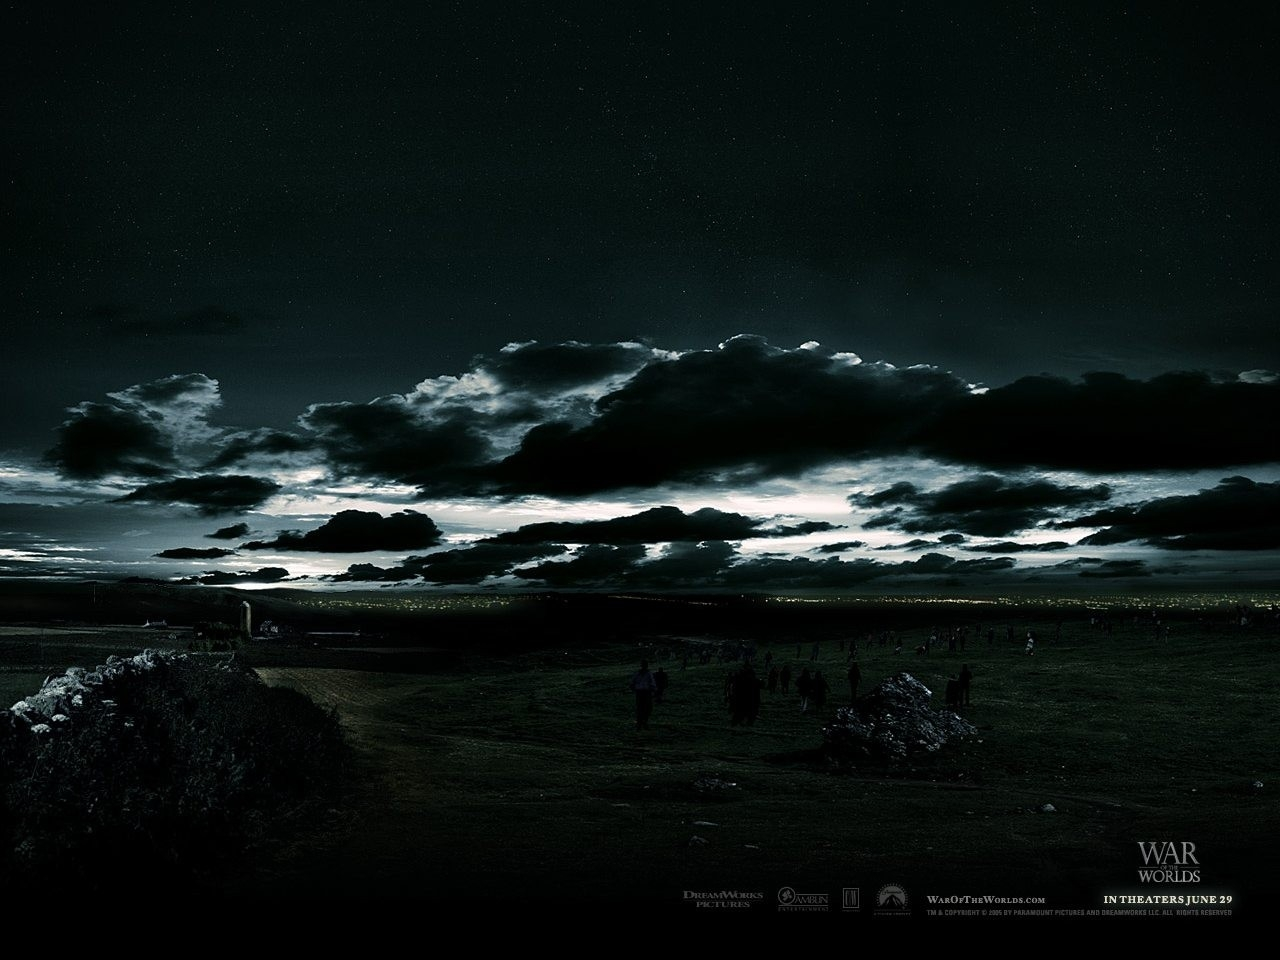 Wallpaper del film La guerra dei mondi